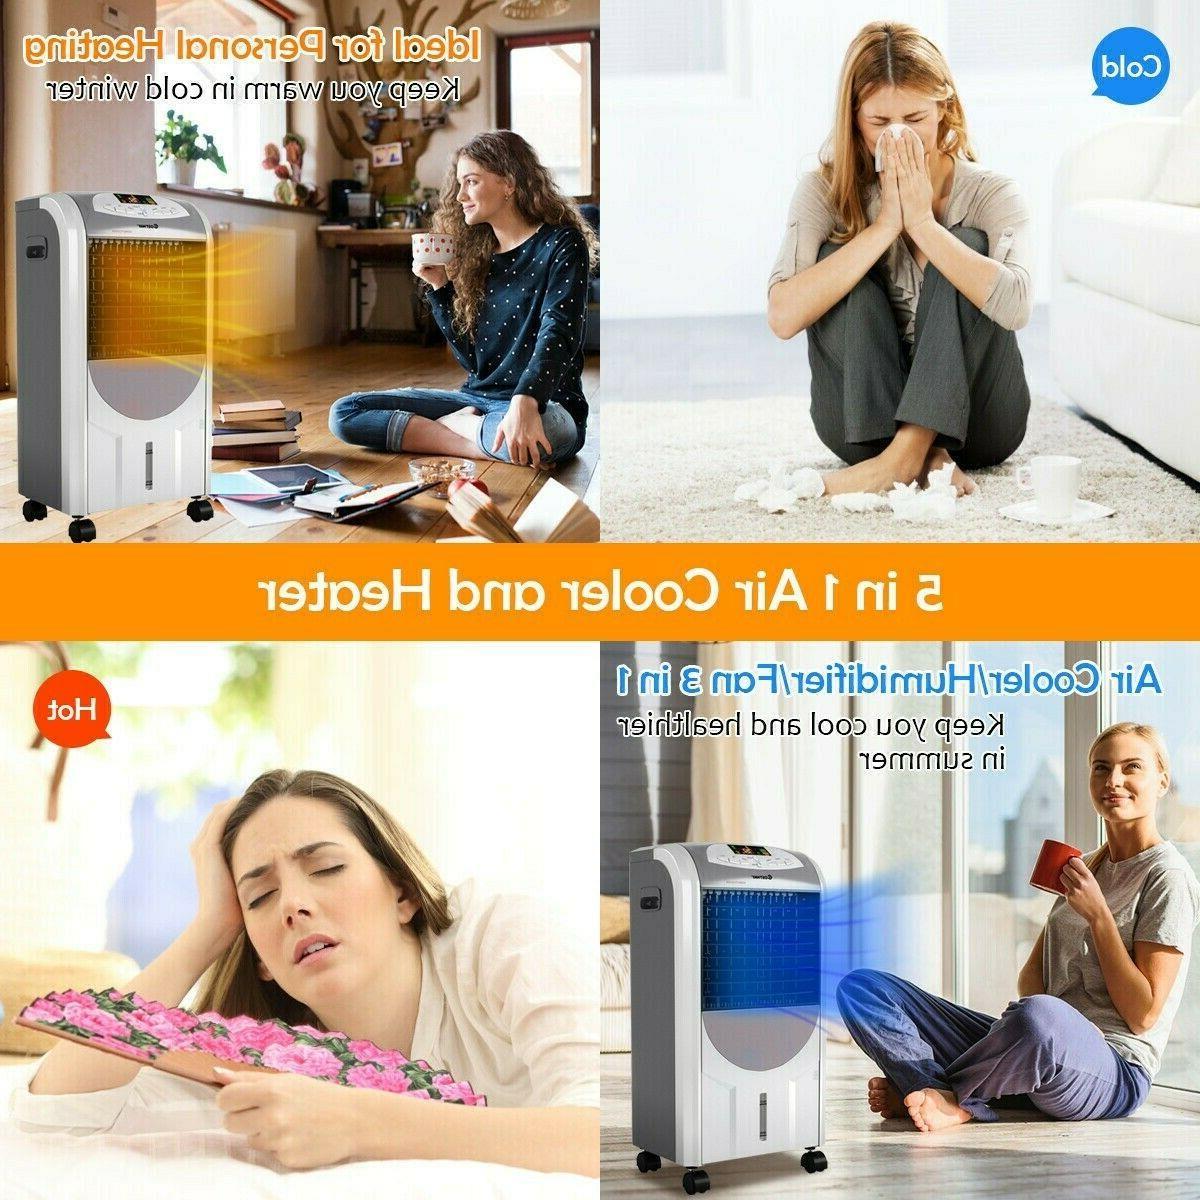 5 in 1 Evaporative Portable Air Cooler Fan & Remote Control